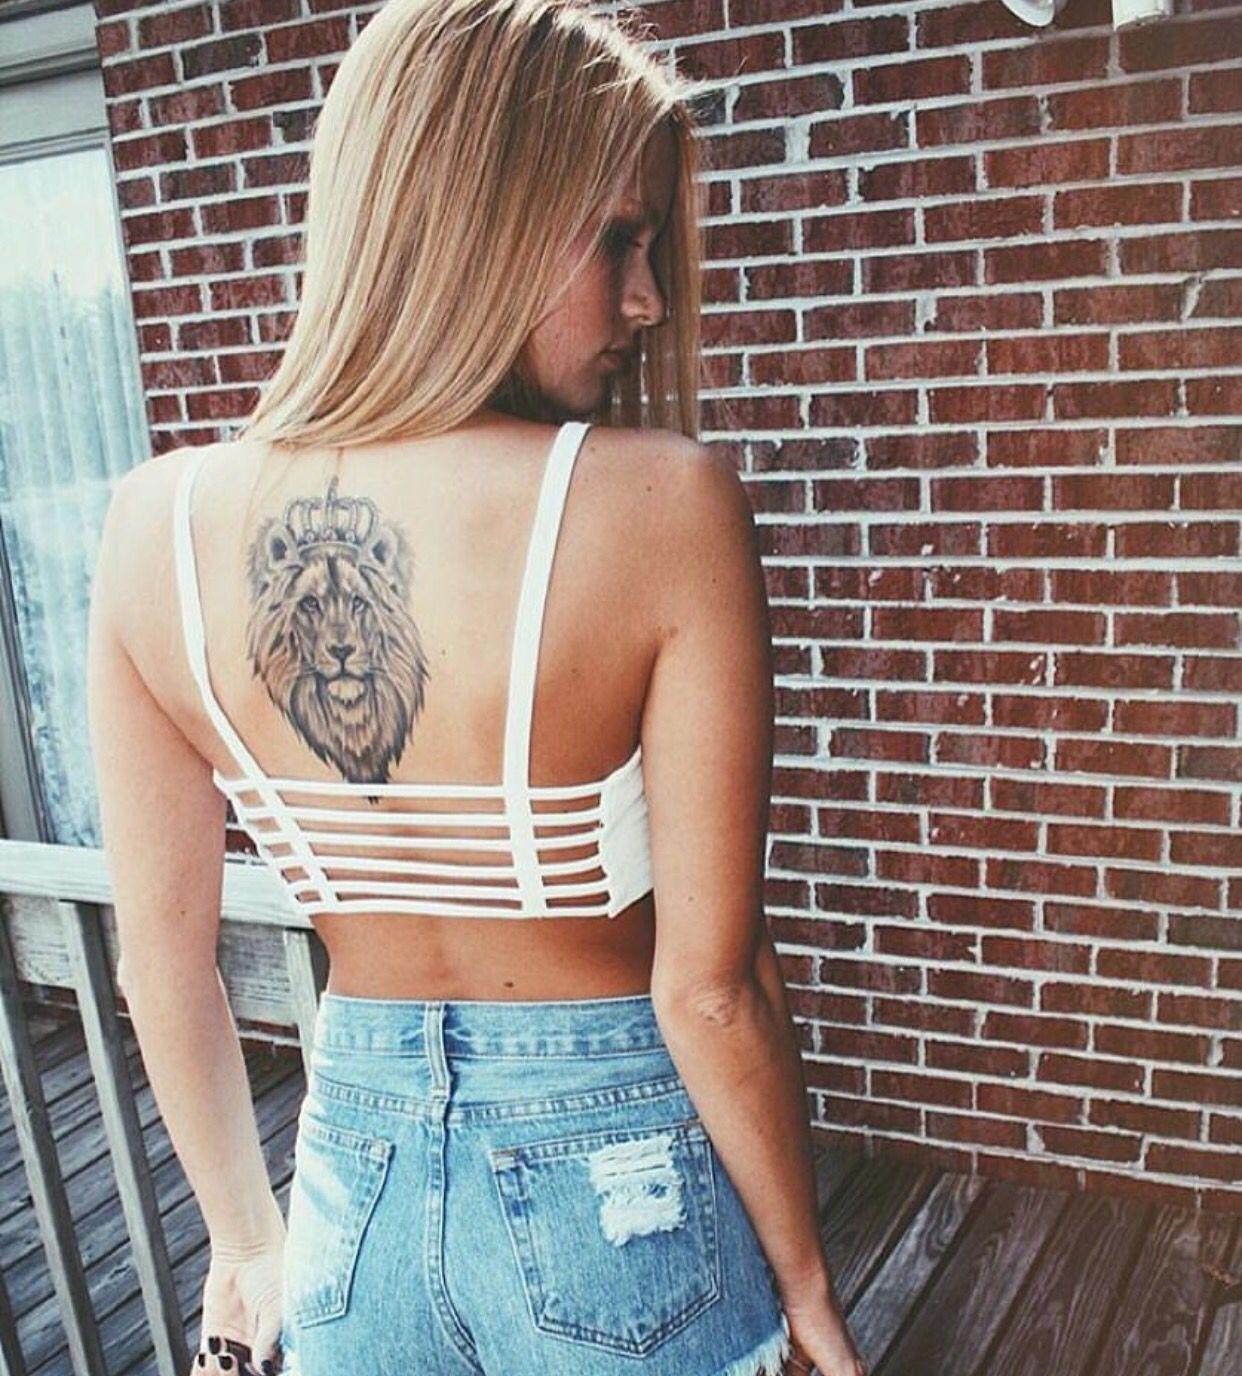 Ink Tattoo Lion Back Girls And Tattoos Lion Back Tattoo Lion